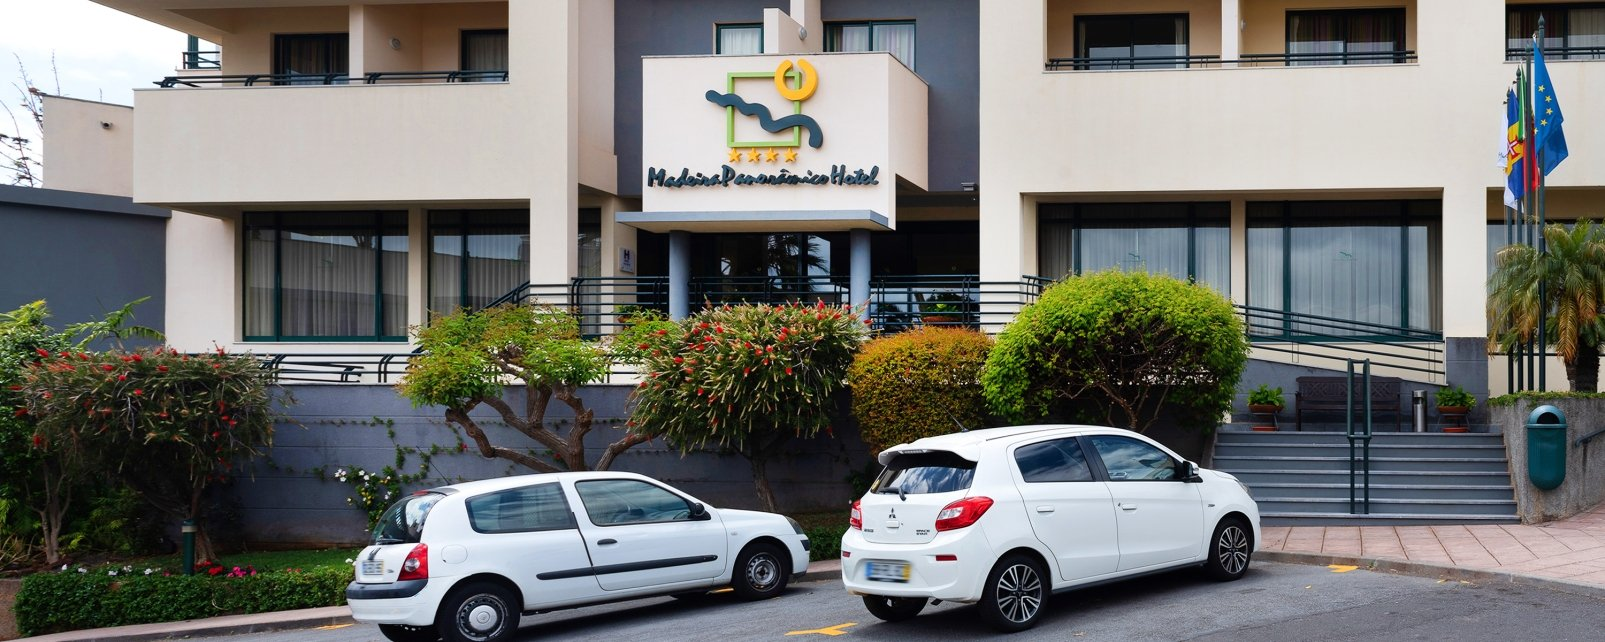 Hôtel Madeira Panorâmico